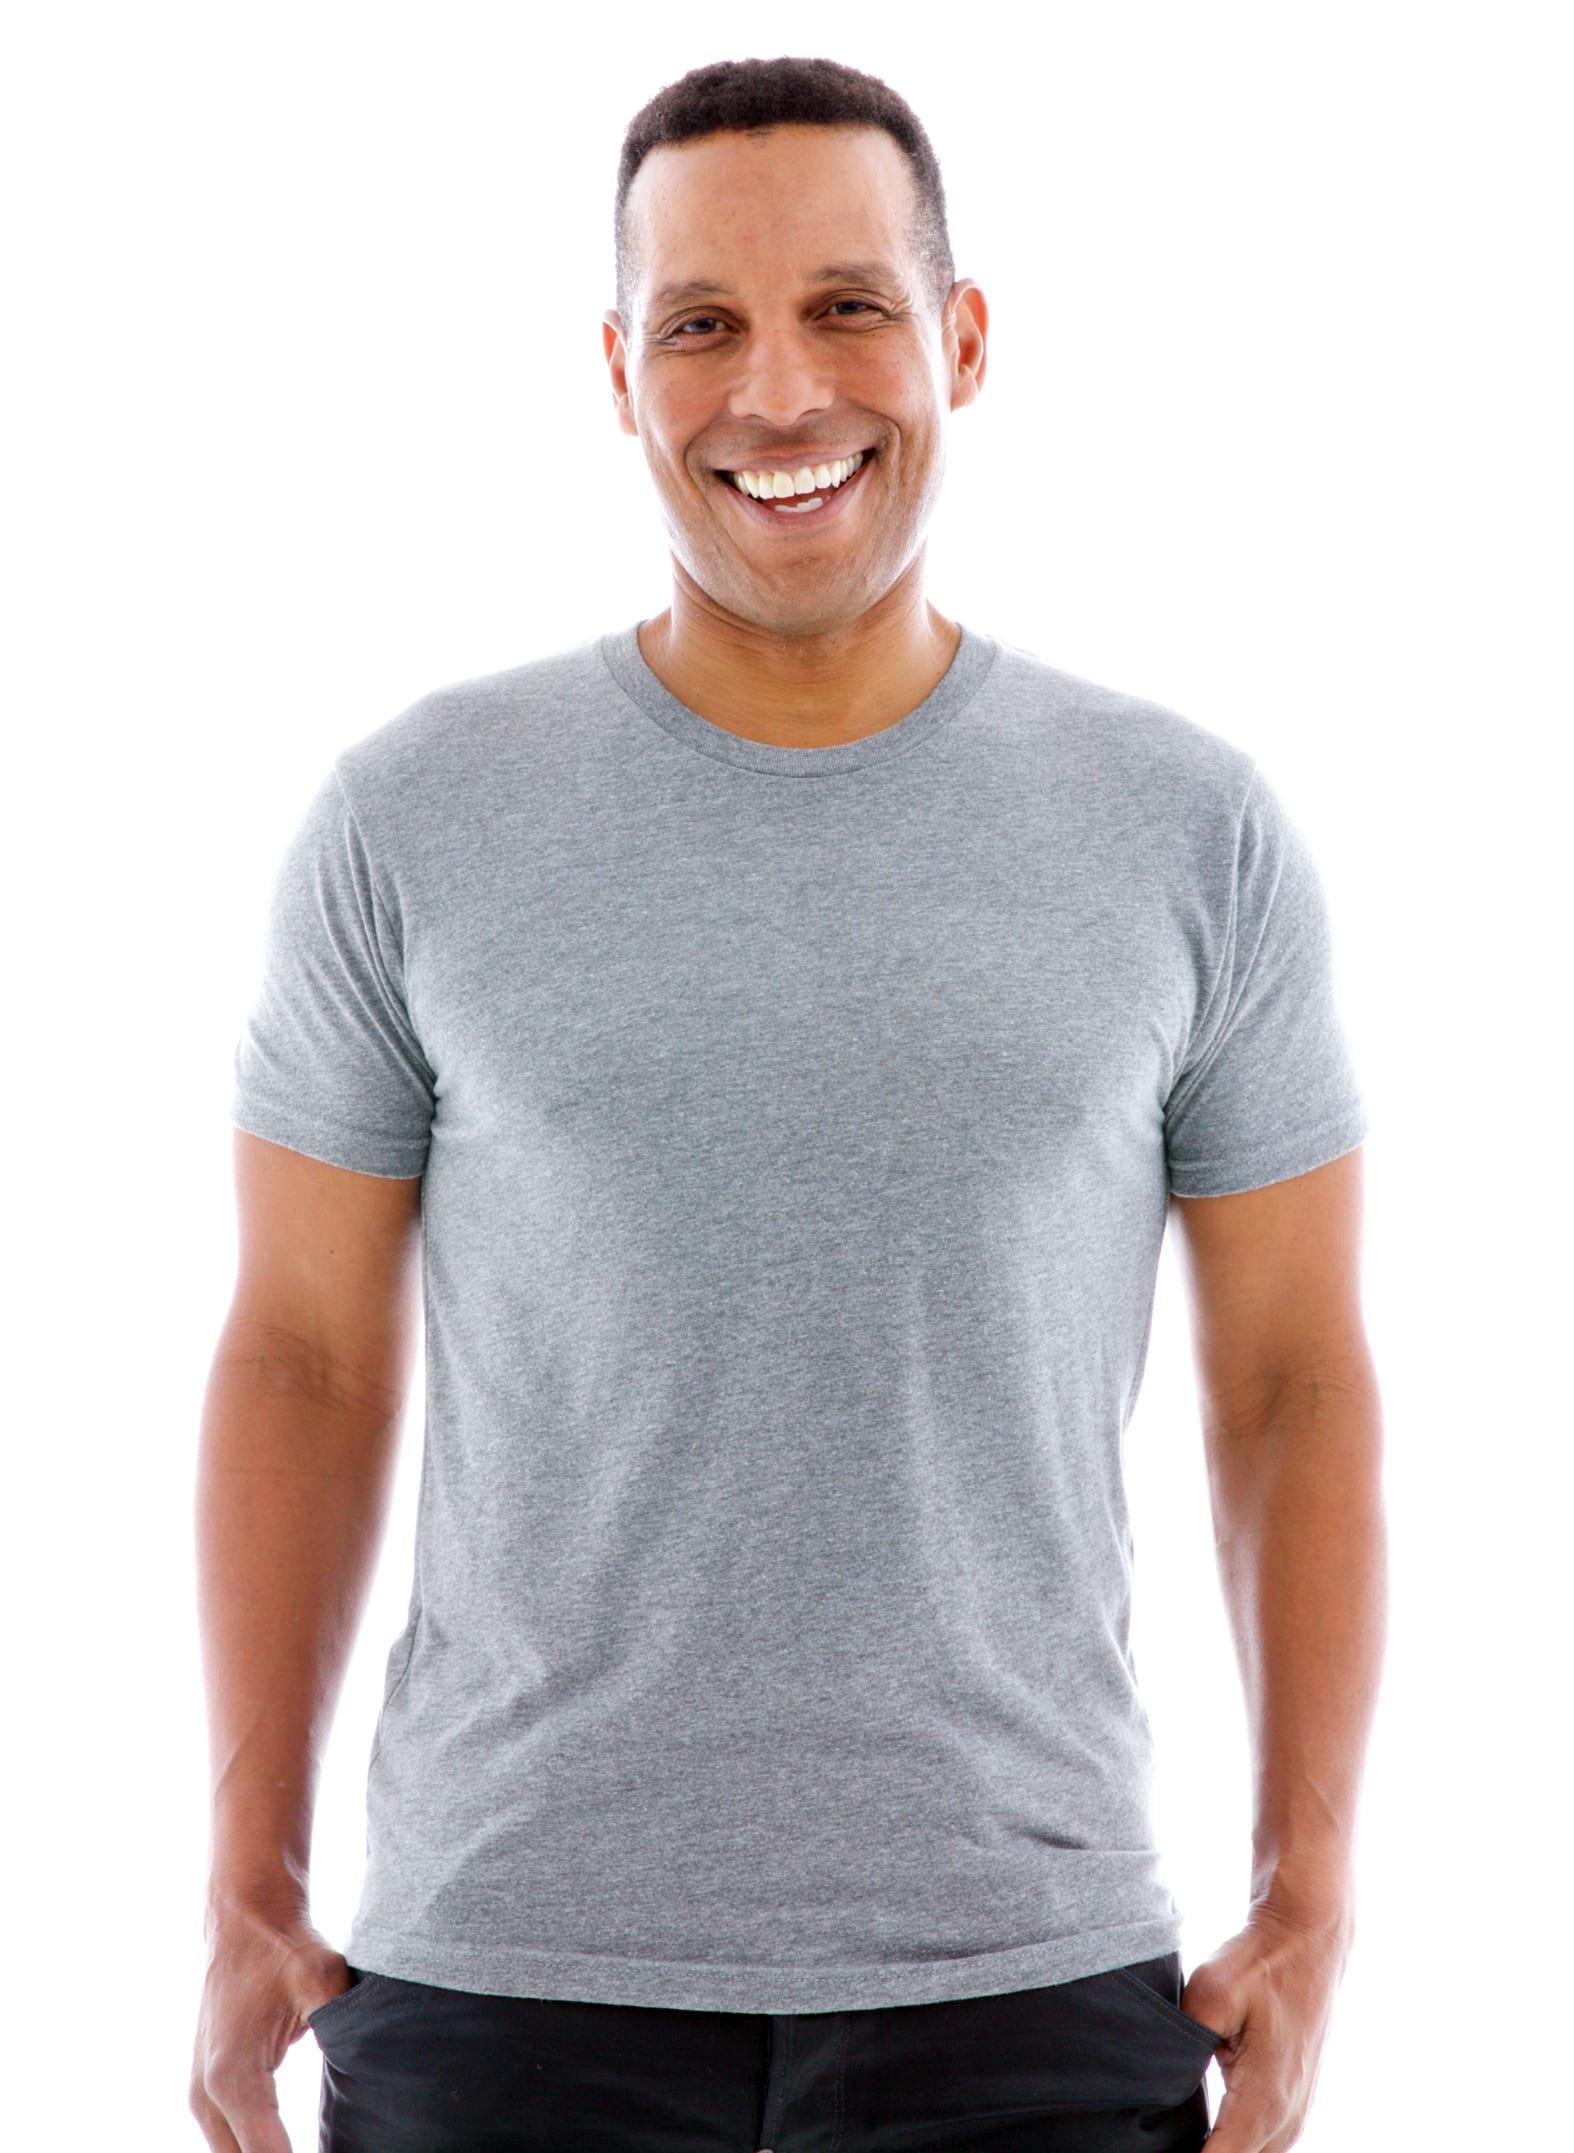 Triblend Jersey Crew Short Sleeve T-Shirt Front View